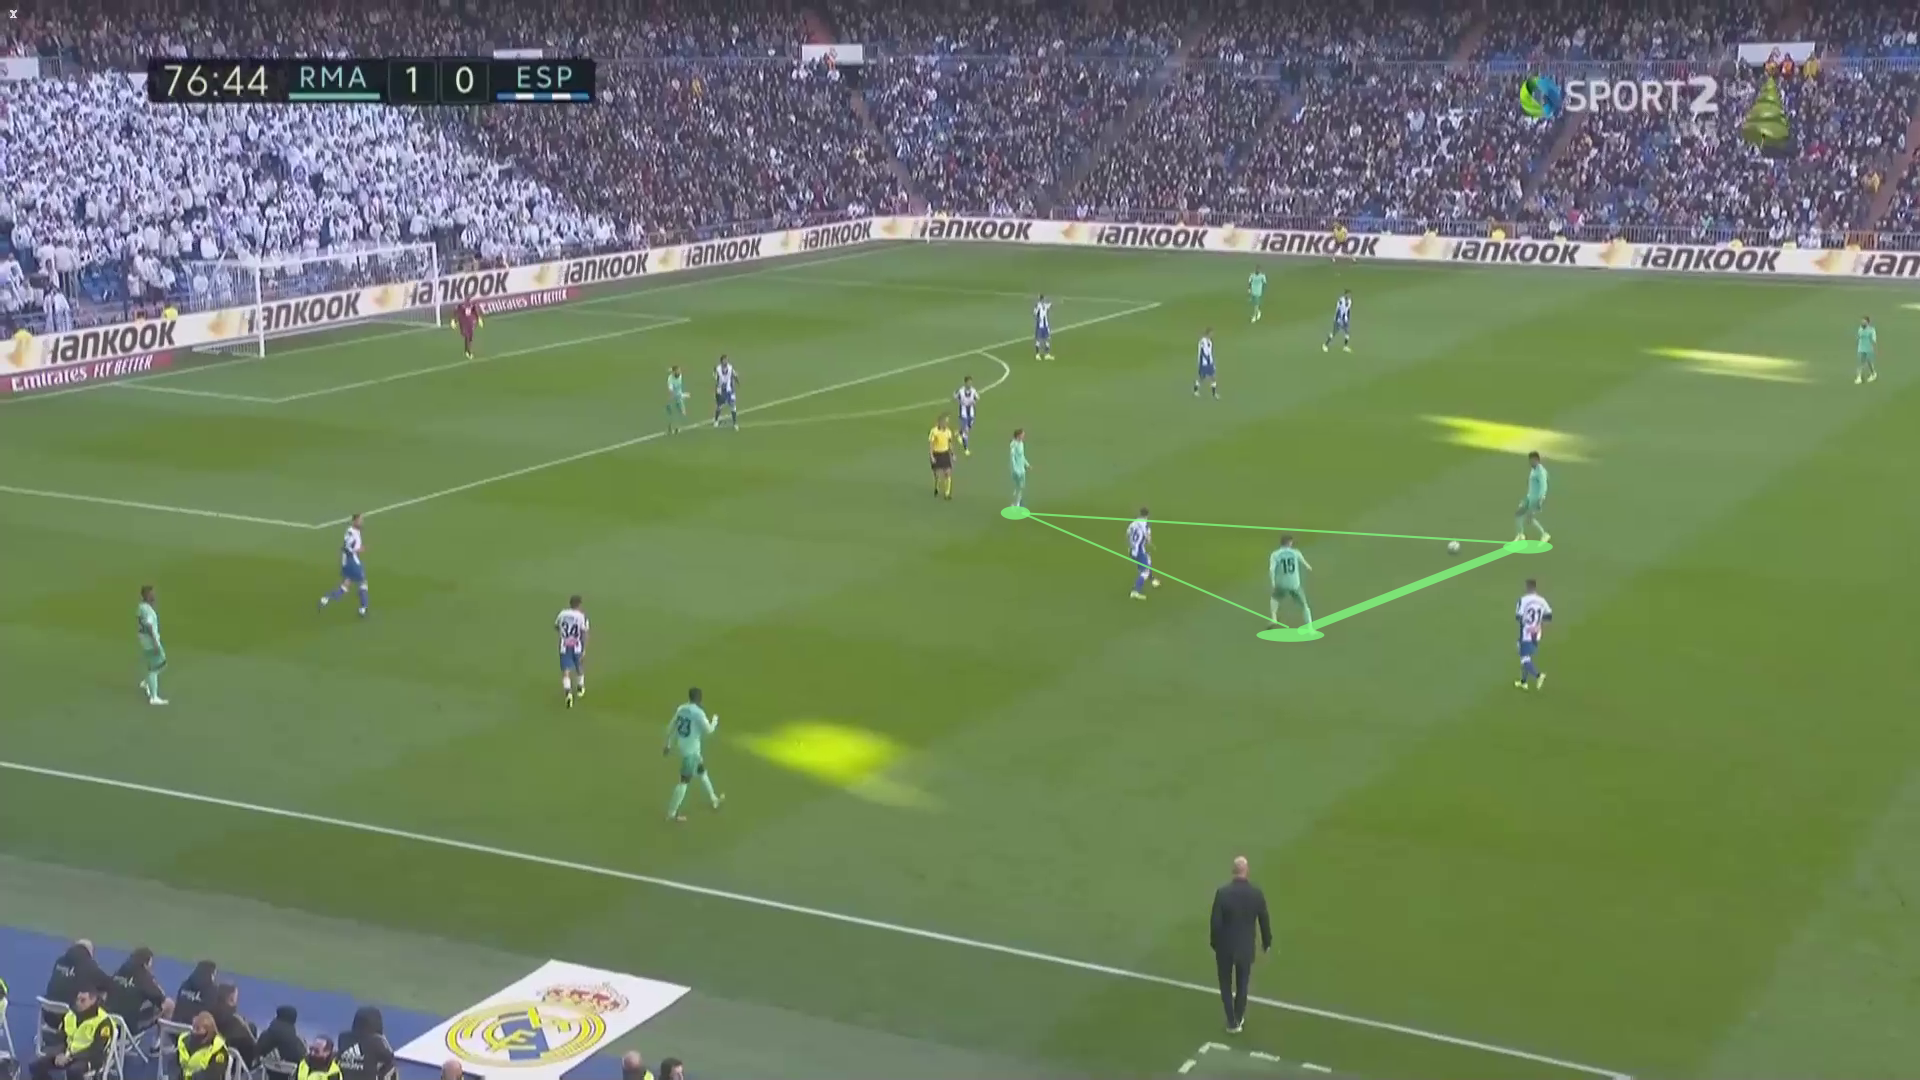 La Liga 2019/20: Real Madrid vs Espanyol - tactical analysis tactics